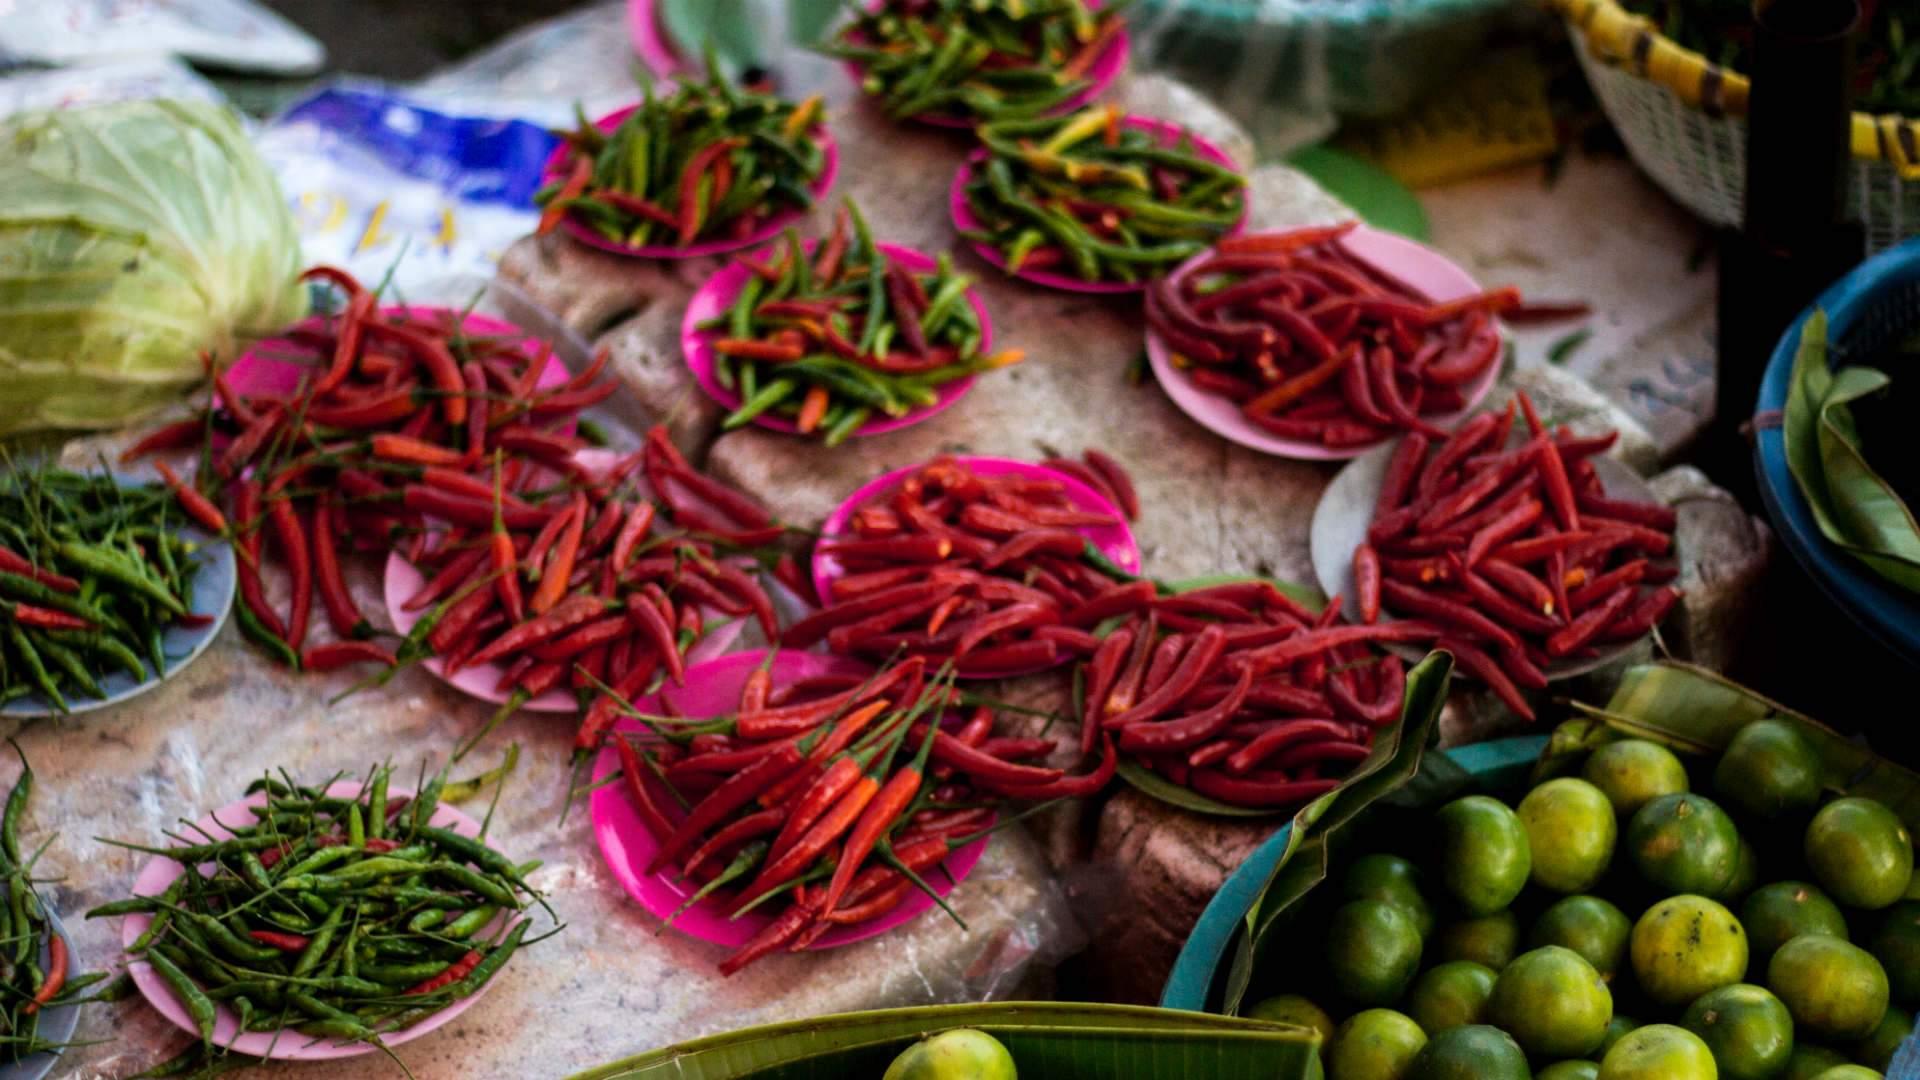 Herb & Chilli Festival